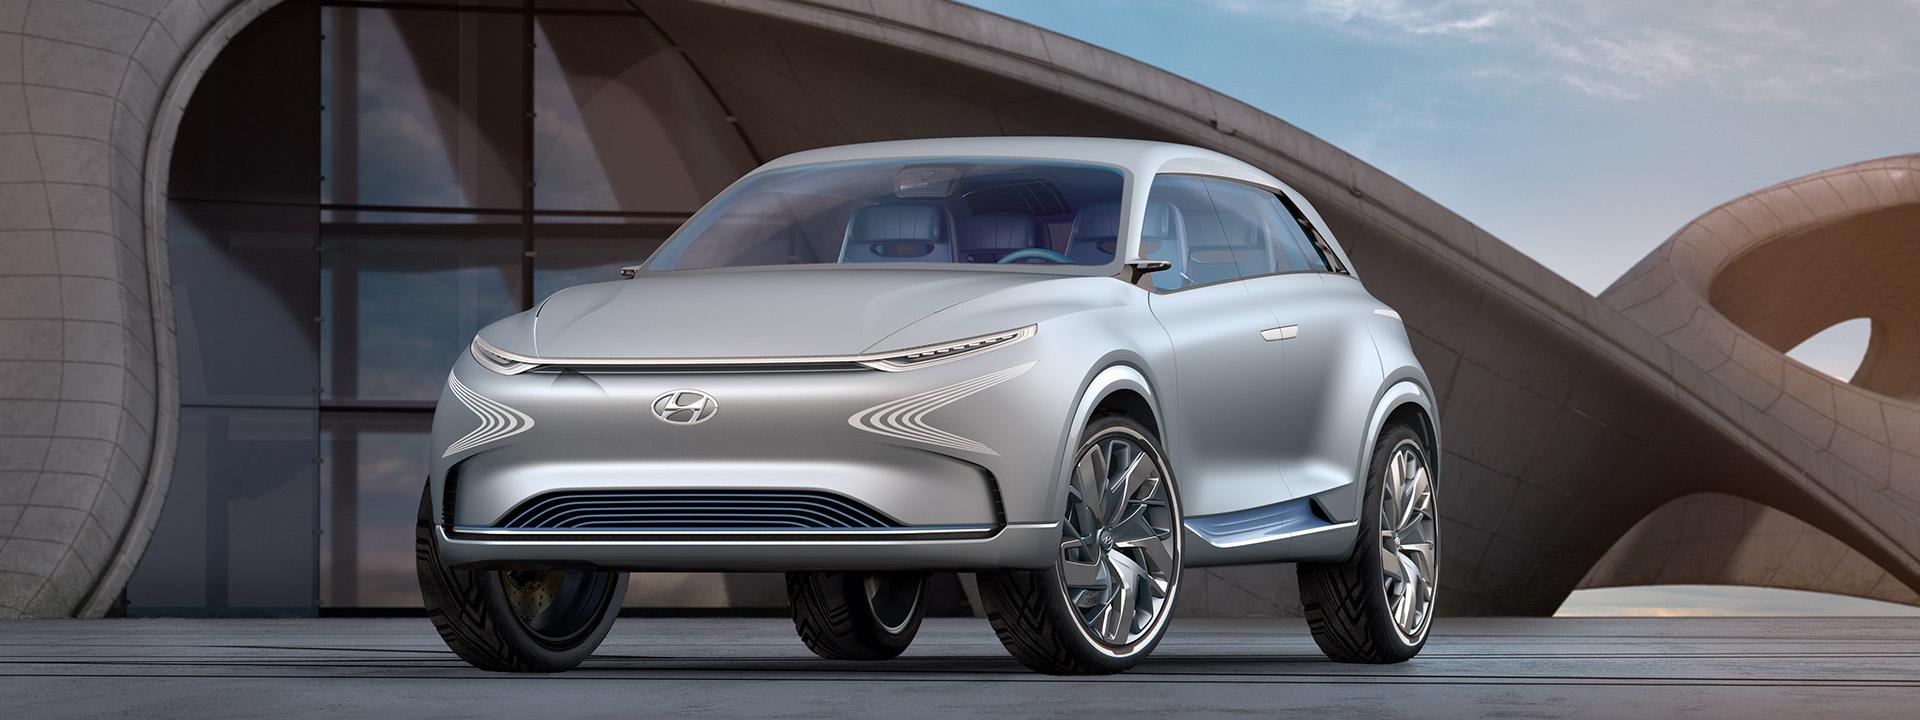 Hyundai Motor at the 2017 Geneva International Motor Show